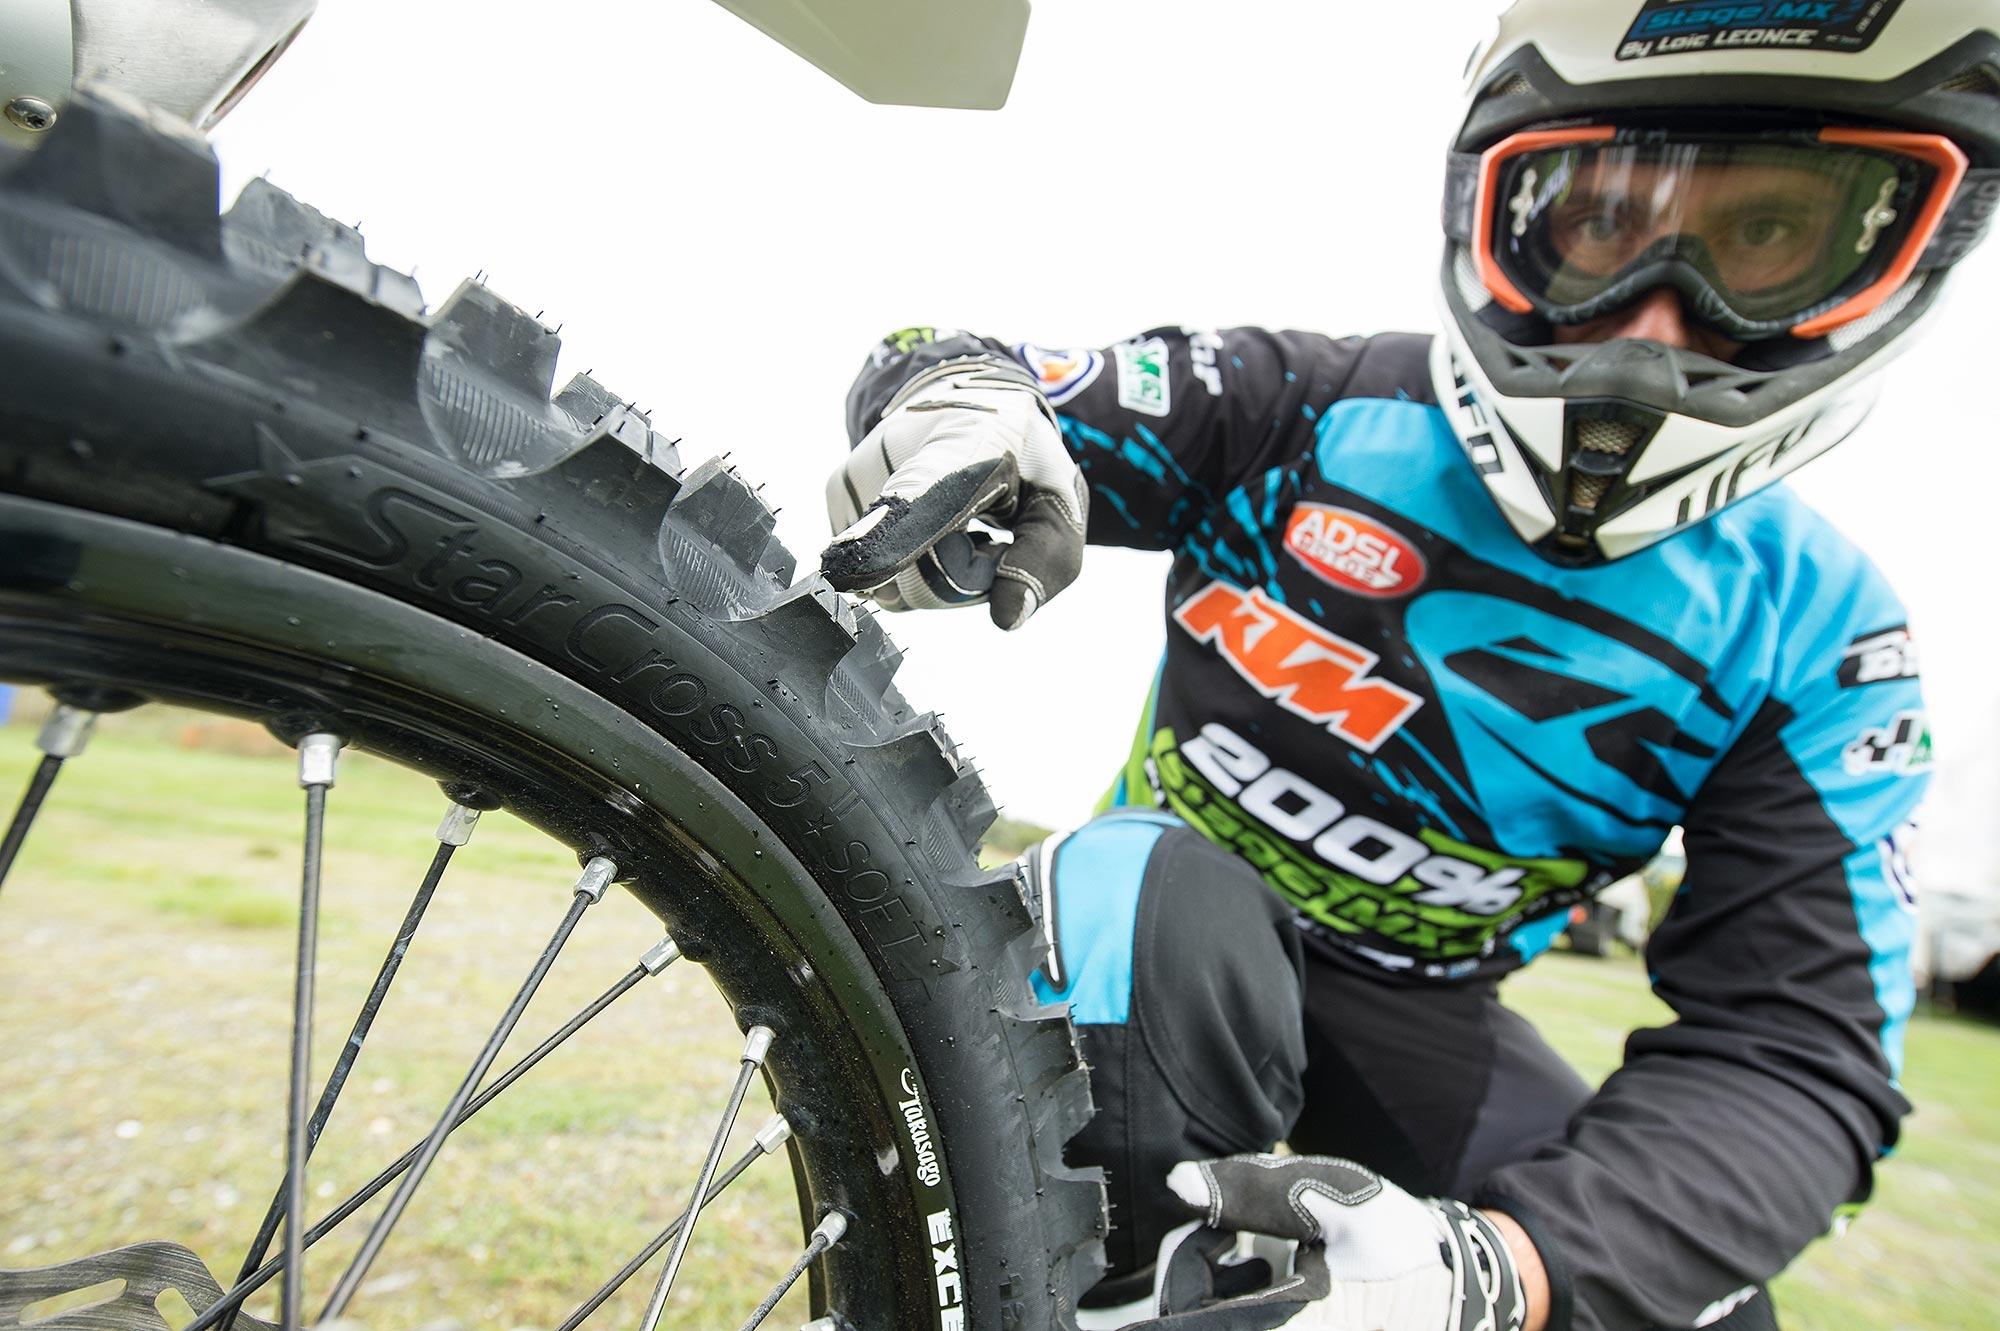 Essai pneus Michelin Starcross 5